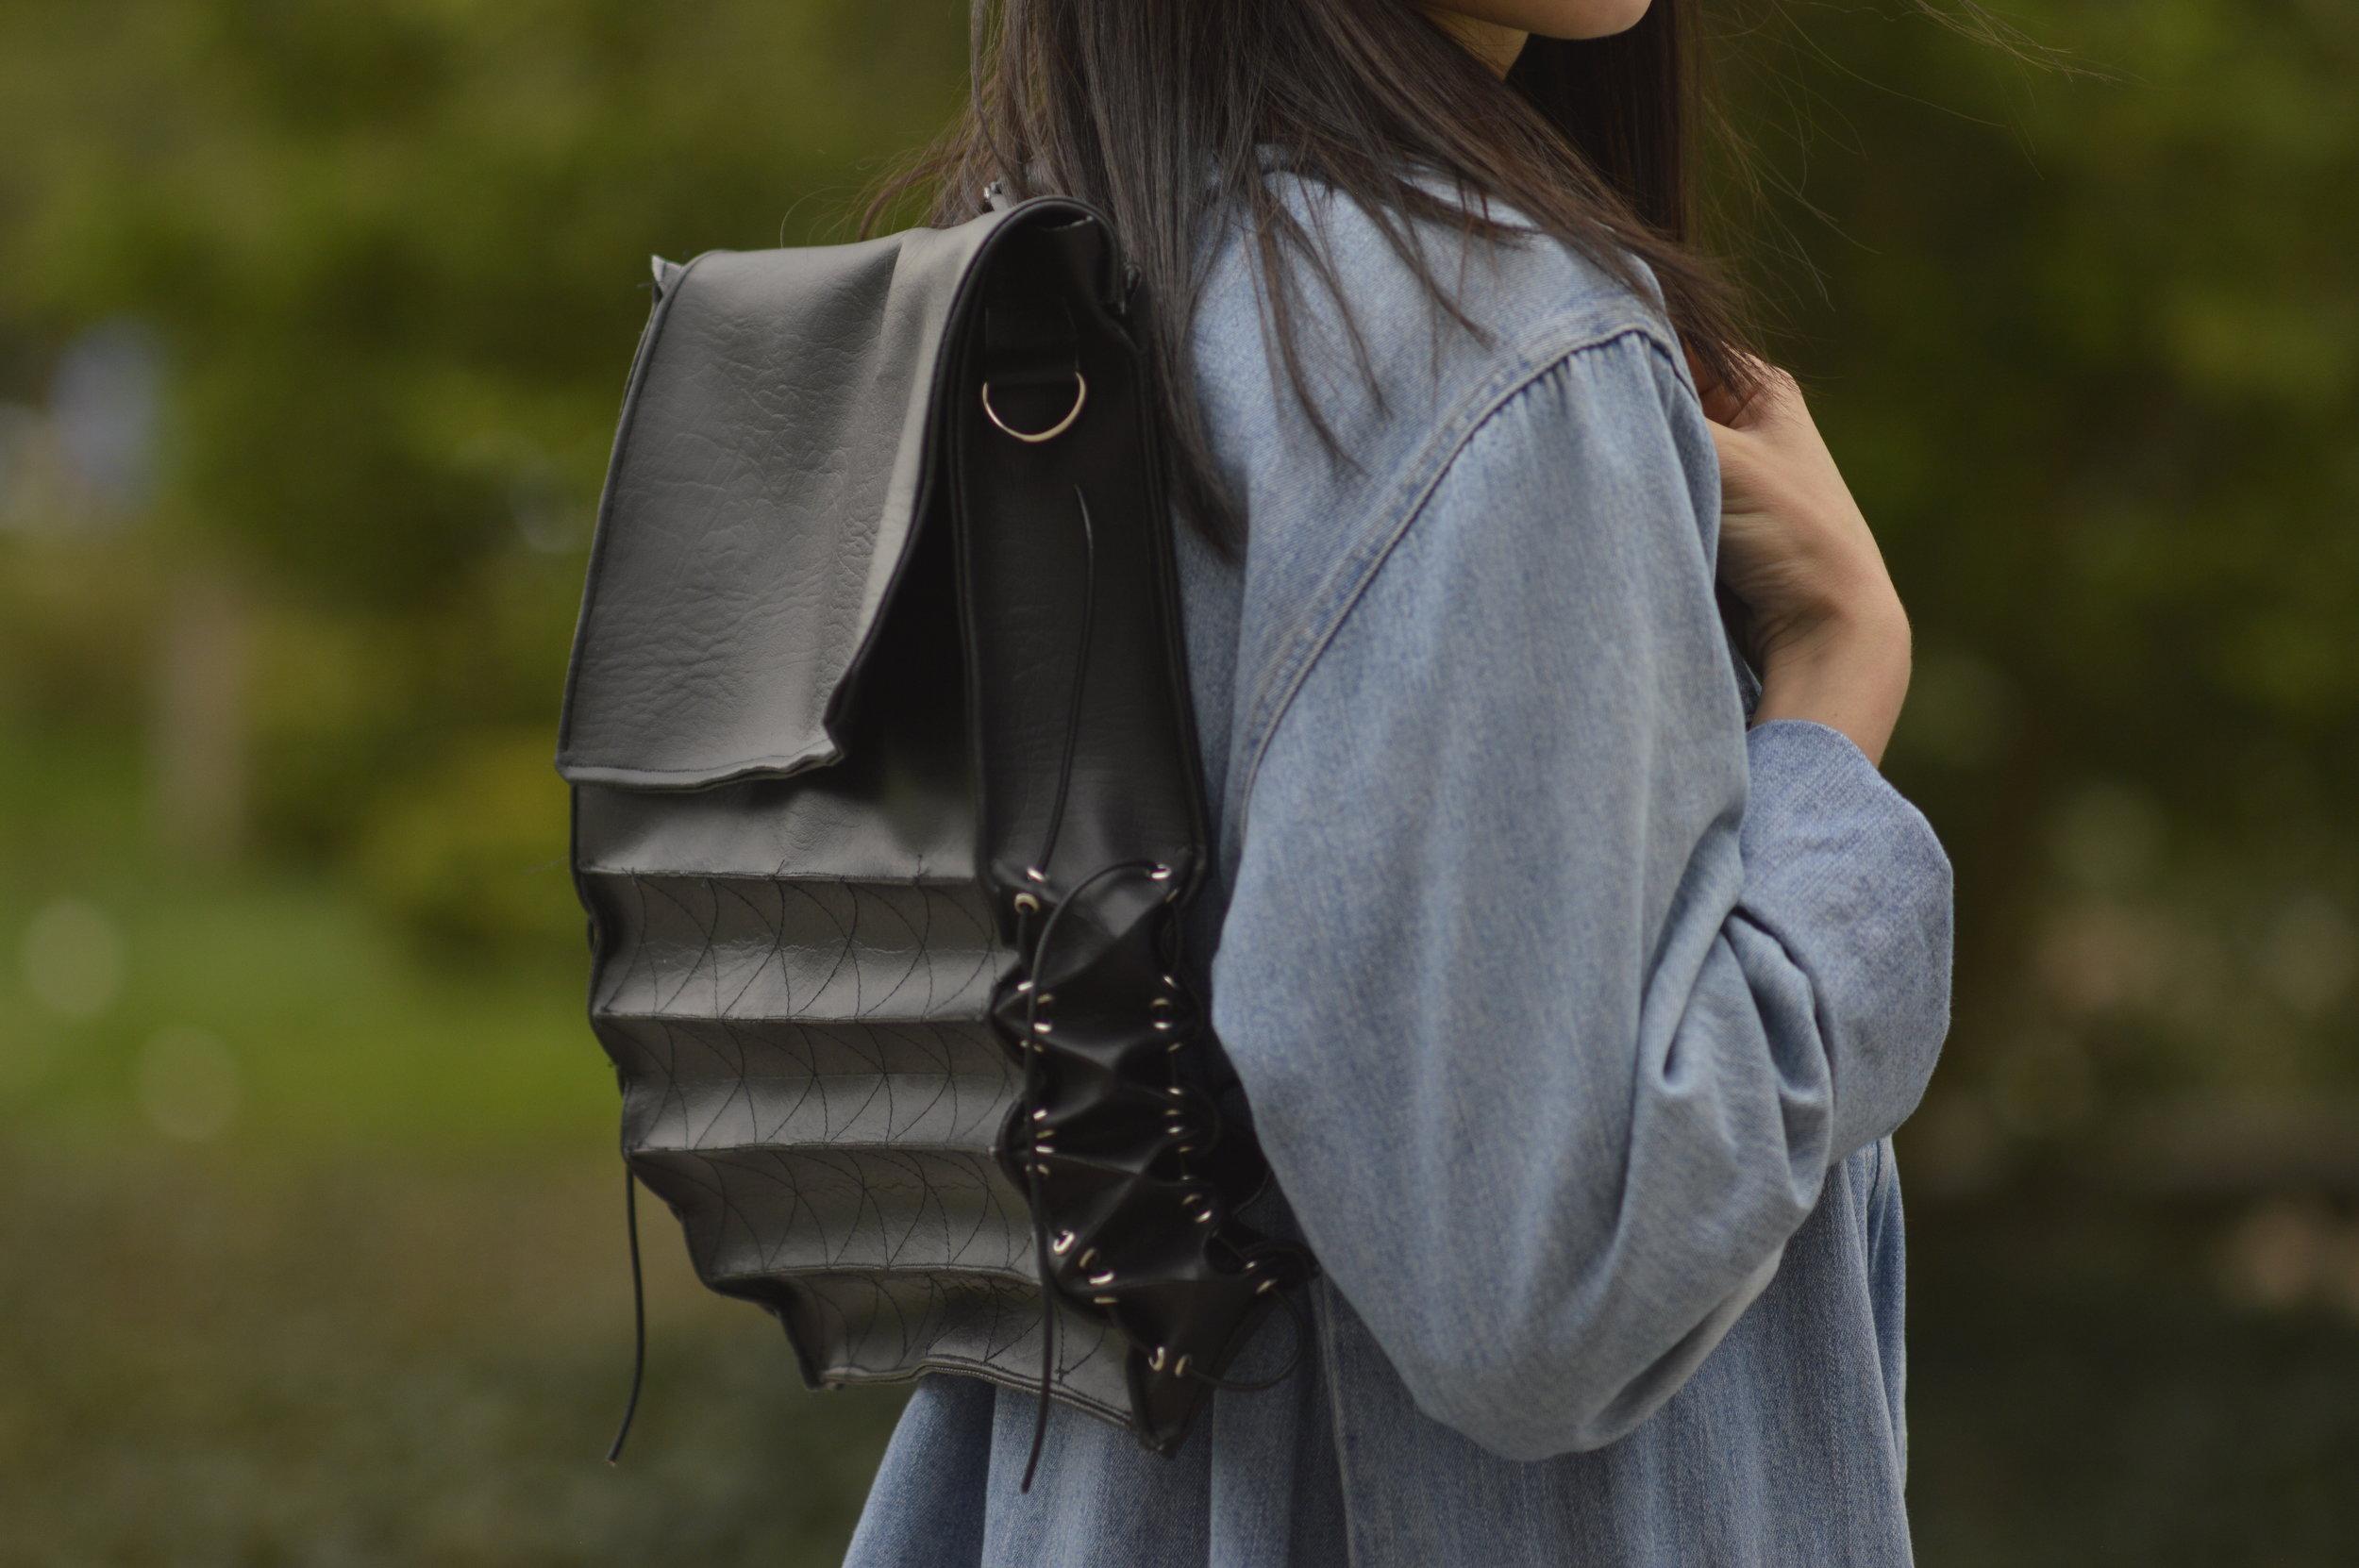 Pleat - Adaptable Bag for Women